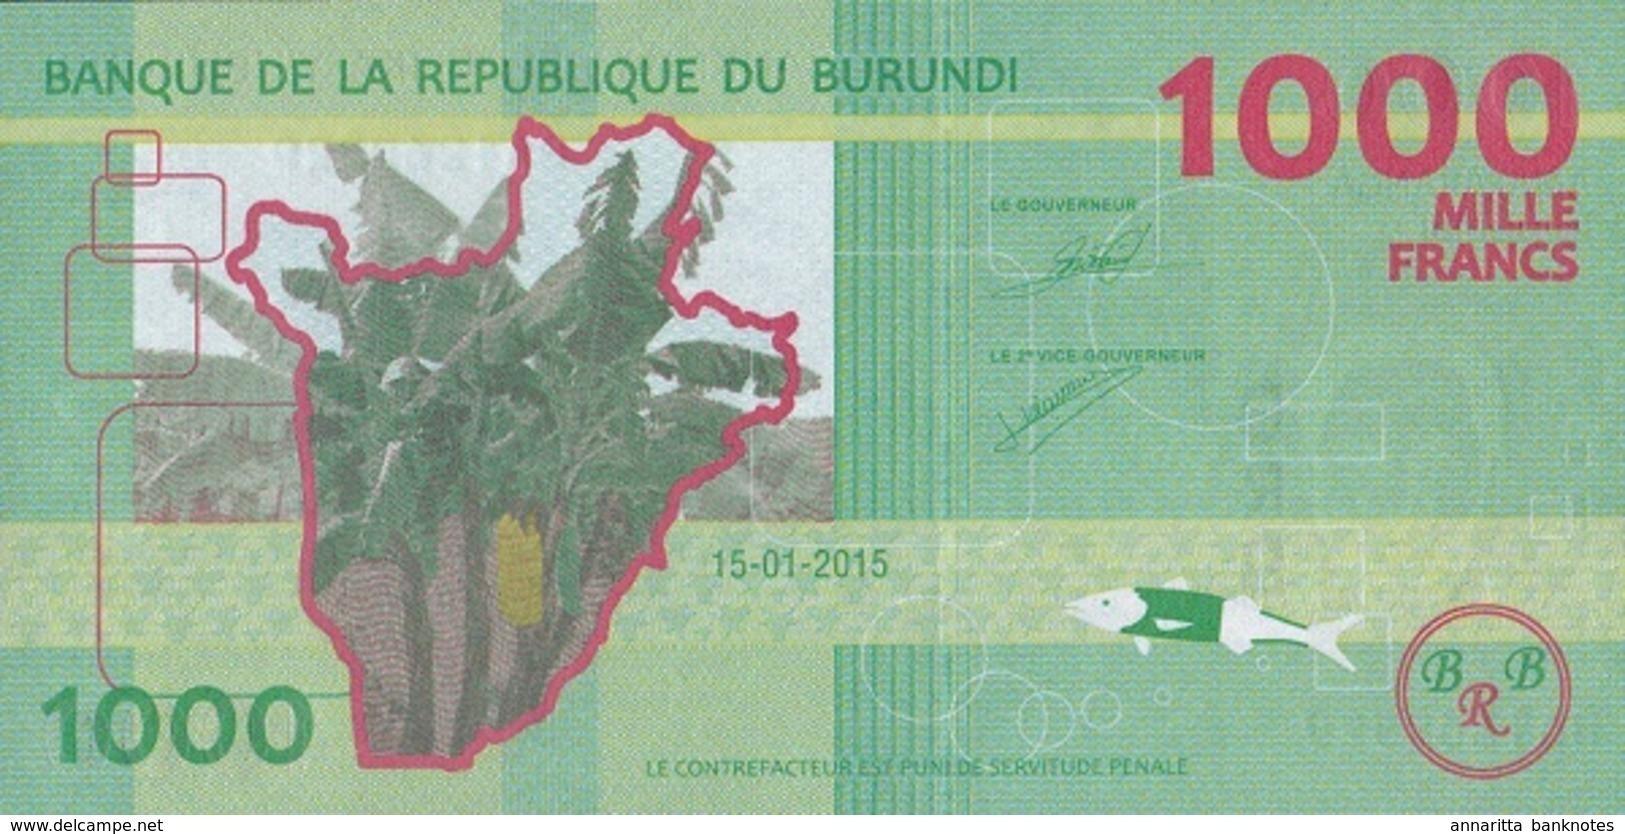 BURUNDI 1000 FRANCS 2015 P-51a UNC [BI237a] - Burundi